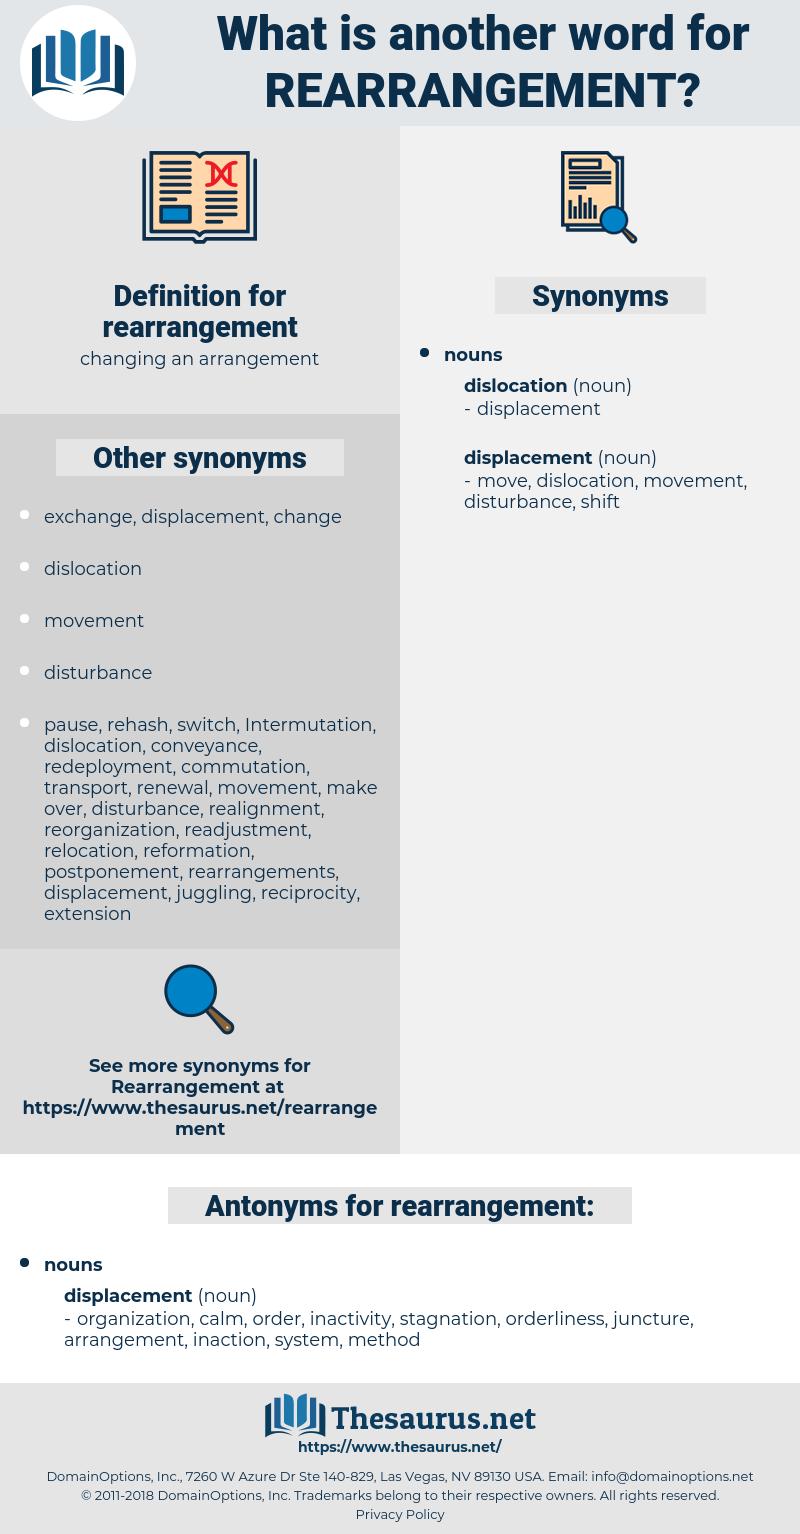 rearrangement, synonym rearrangement, another word for rearrangement, words like rearrangement, thesaurus rearrangement